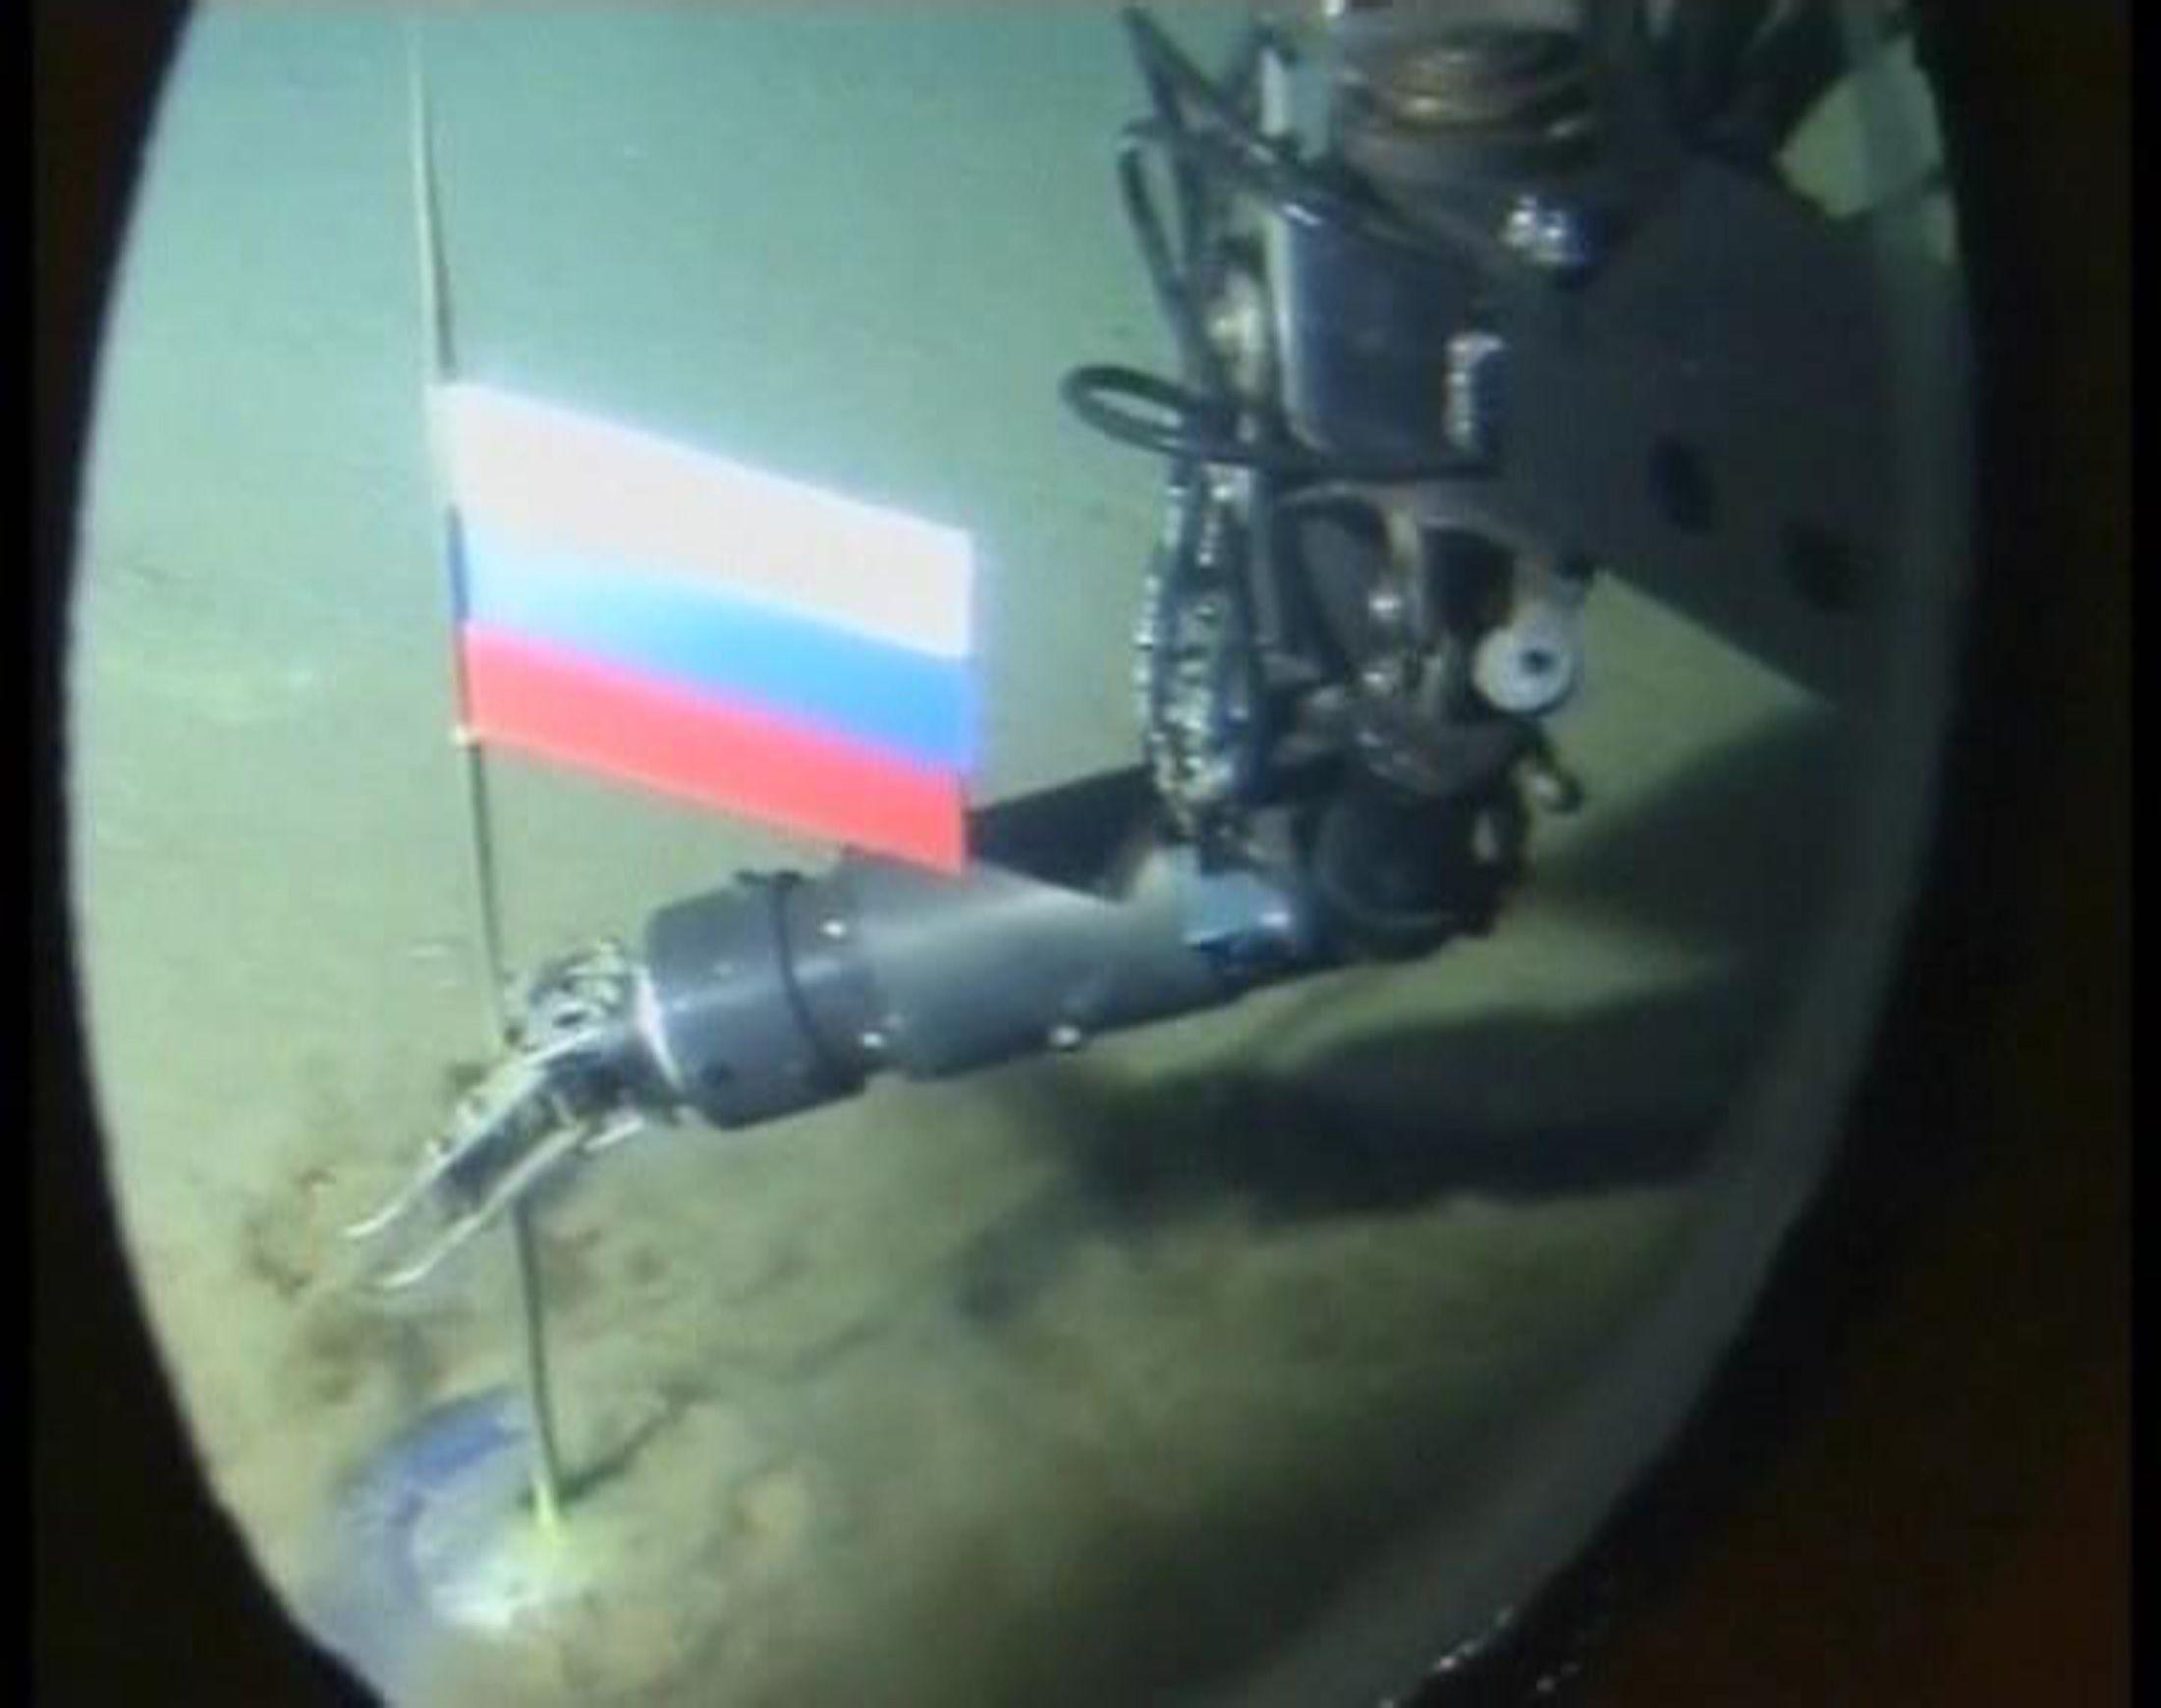 https://s.newsweek.com/sites/www.newsweek.com/files/2015/08/04/russian-flag-north-pole.jpg